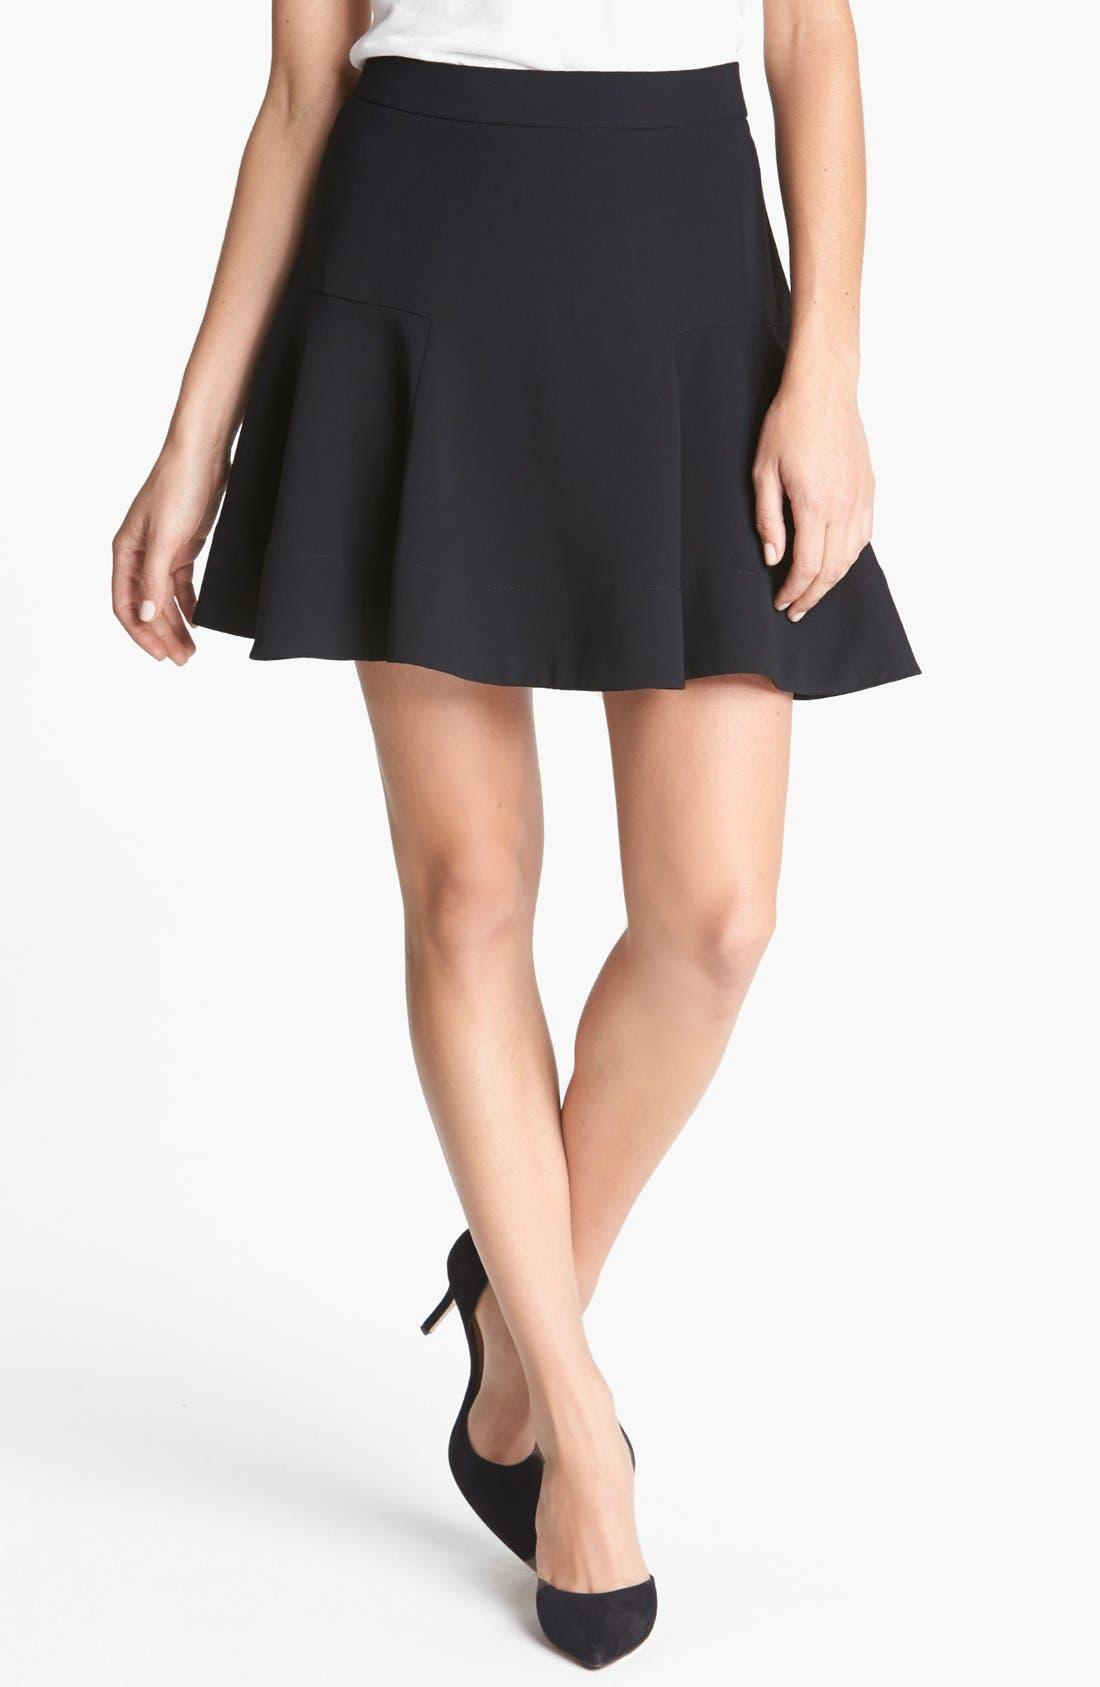 Alternate Image 1 Selected - Robbi & Nikki Fit & Flare Skirt